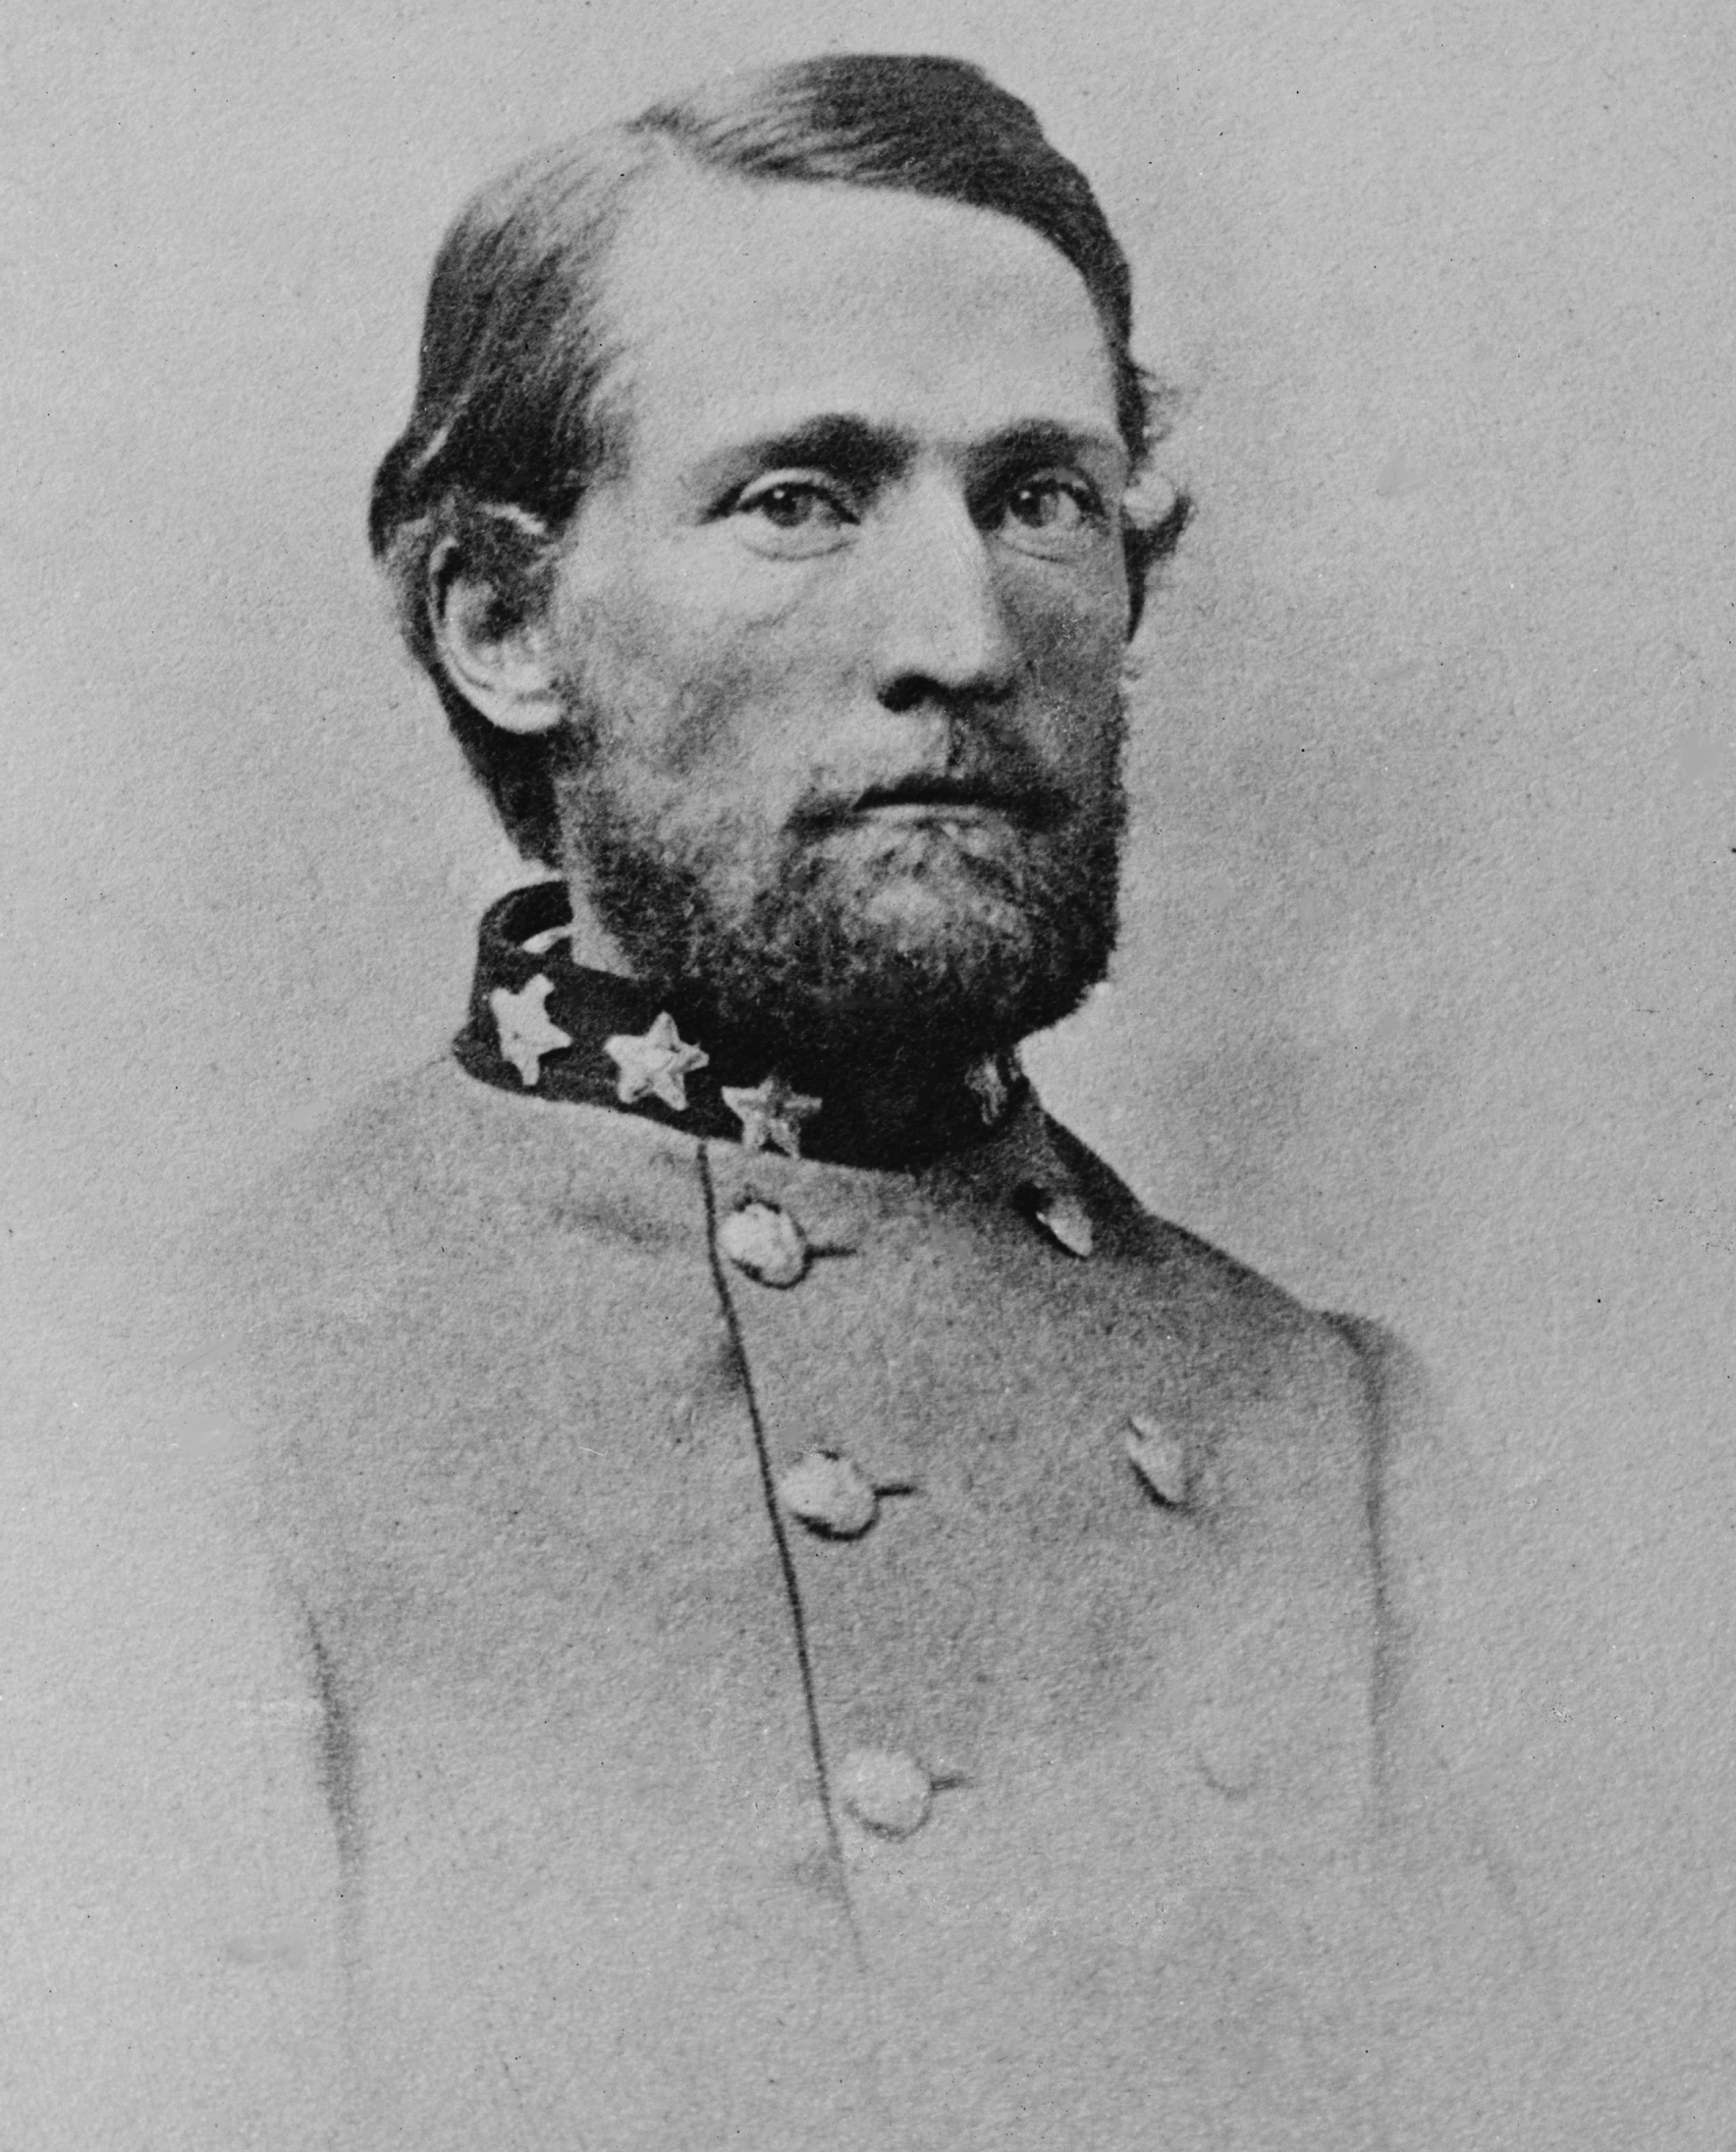 John Lewis Porter